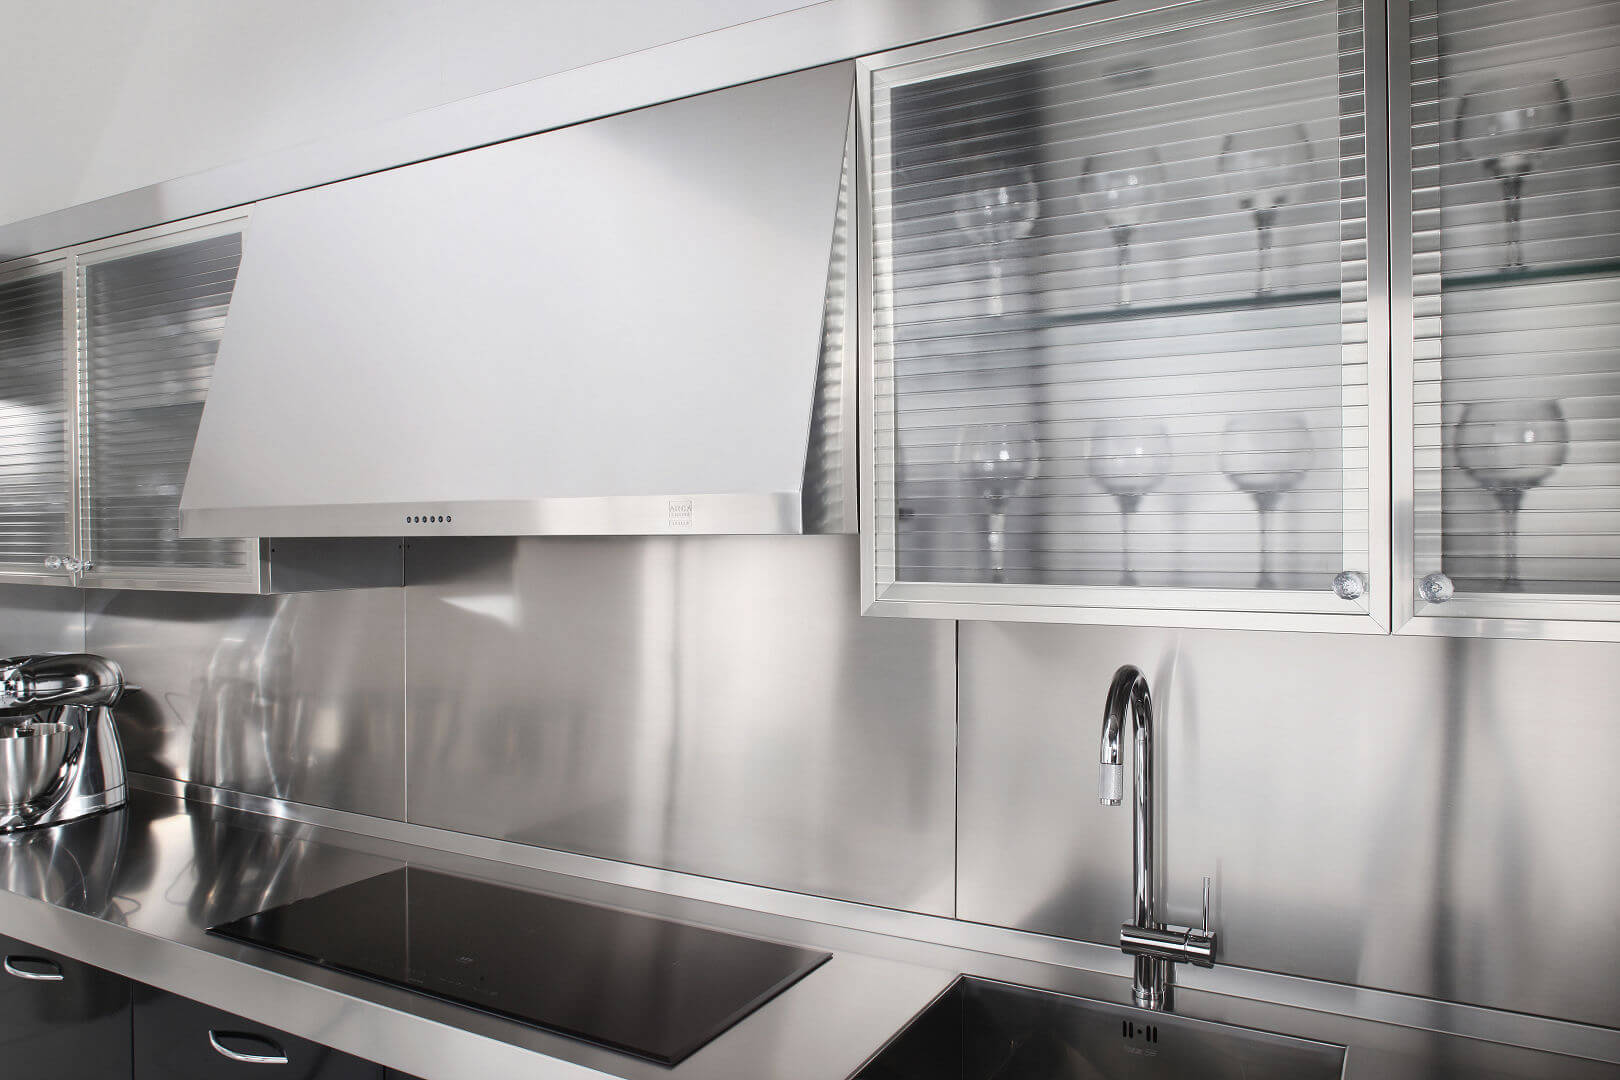 Arca Cucine Italia - Cucine Domestiche in Acciaio Inox - 15 - Essex - Pensili